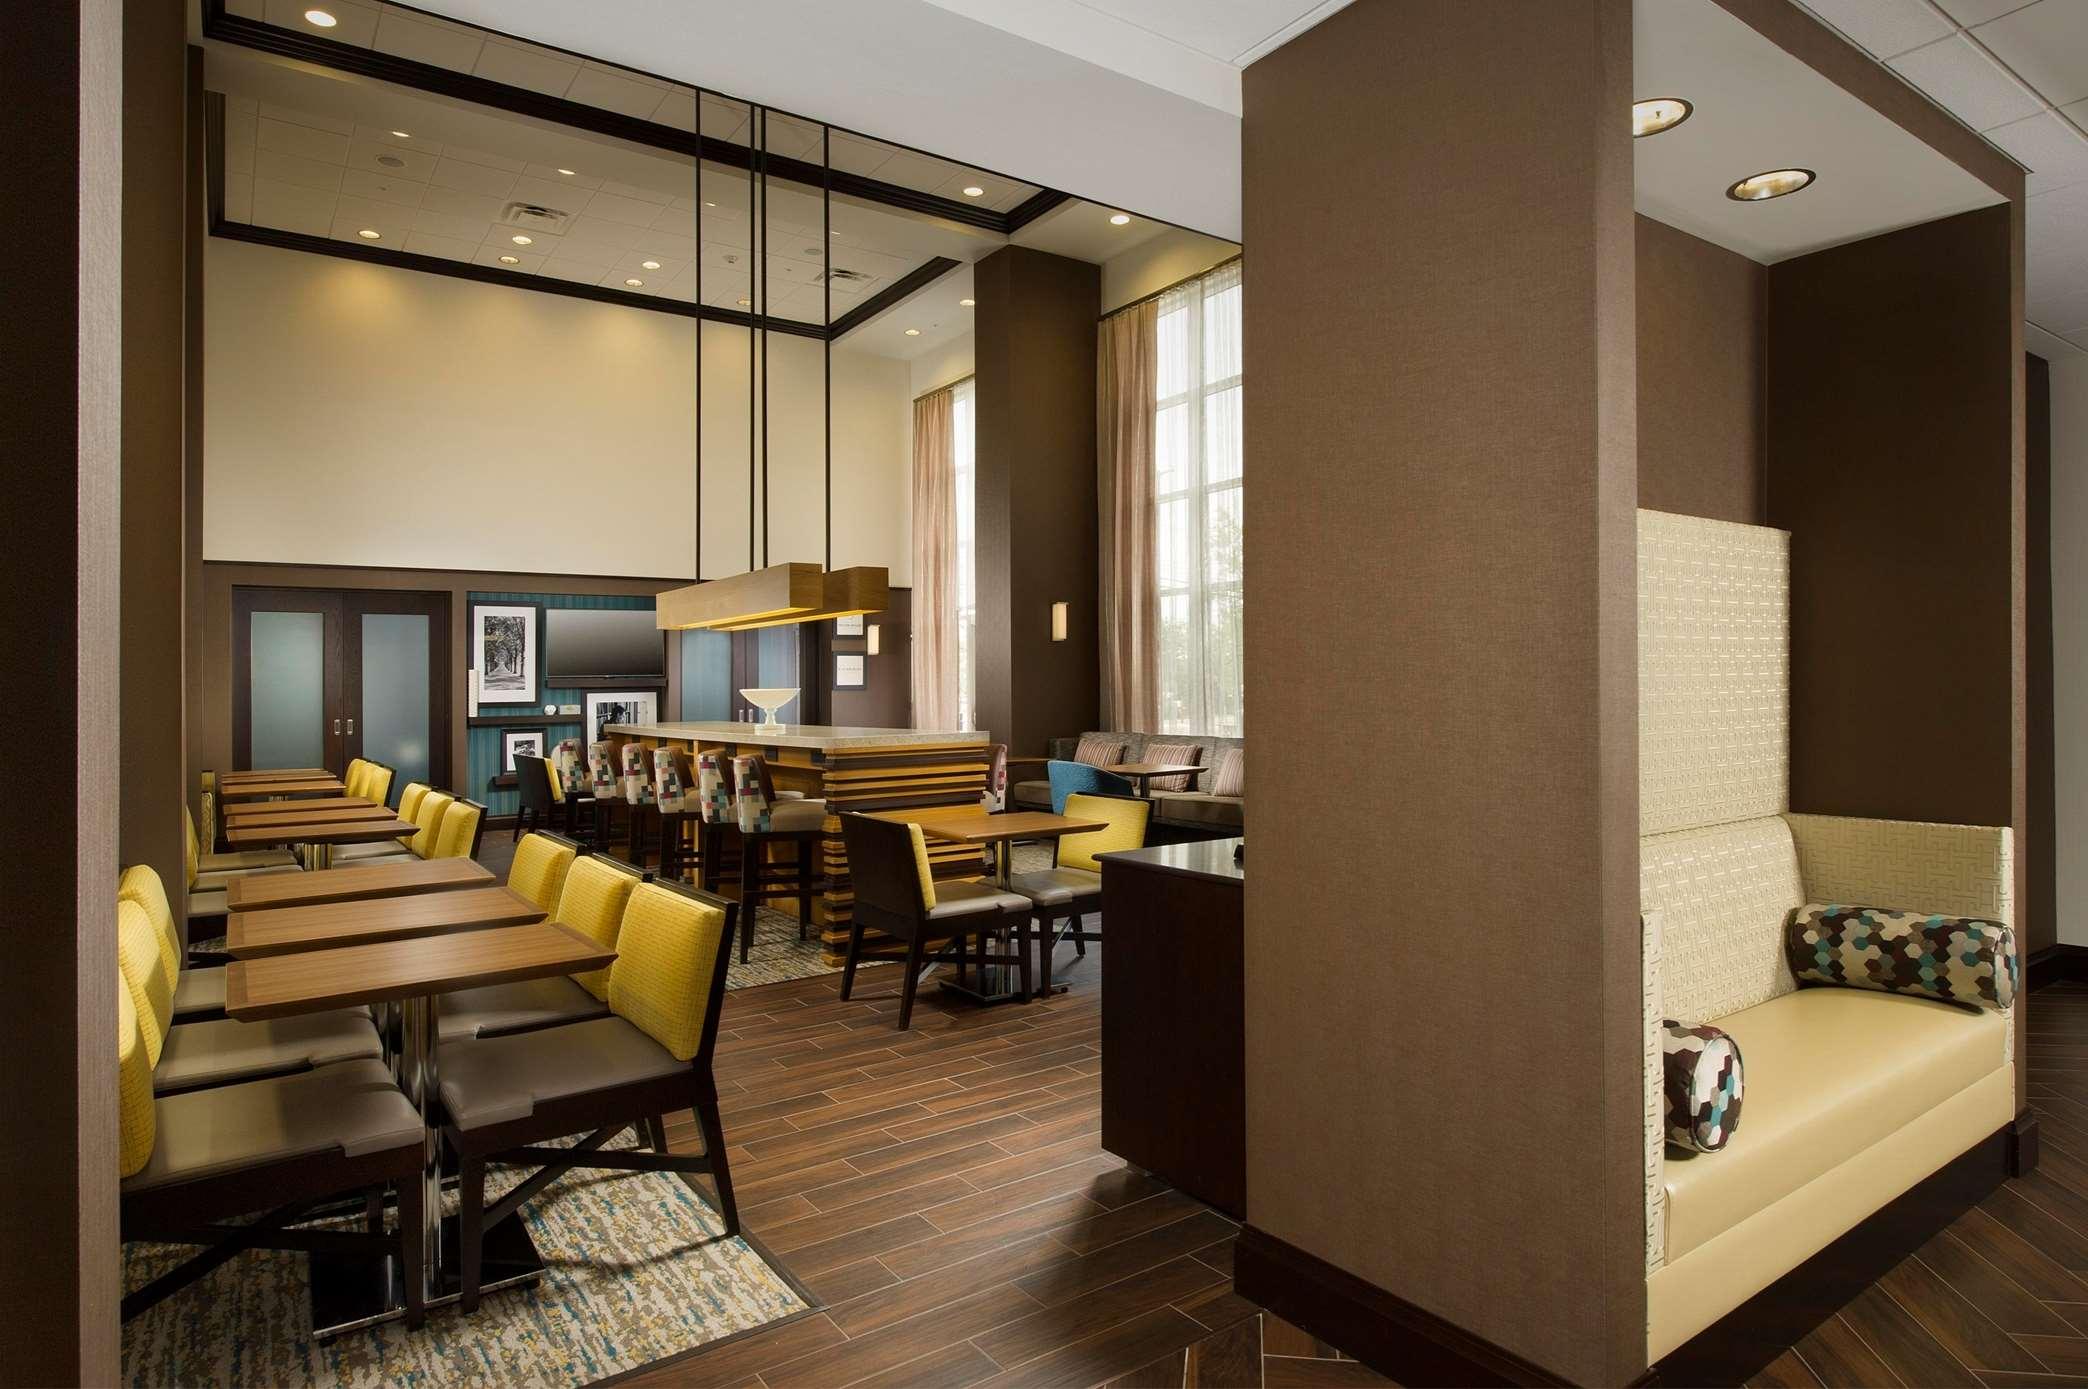 Hampton Inn & Suites Syracuse/Carrier Circle image 2